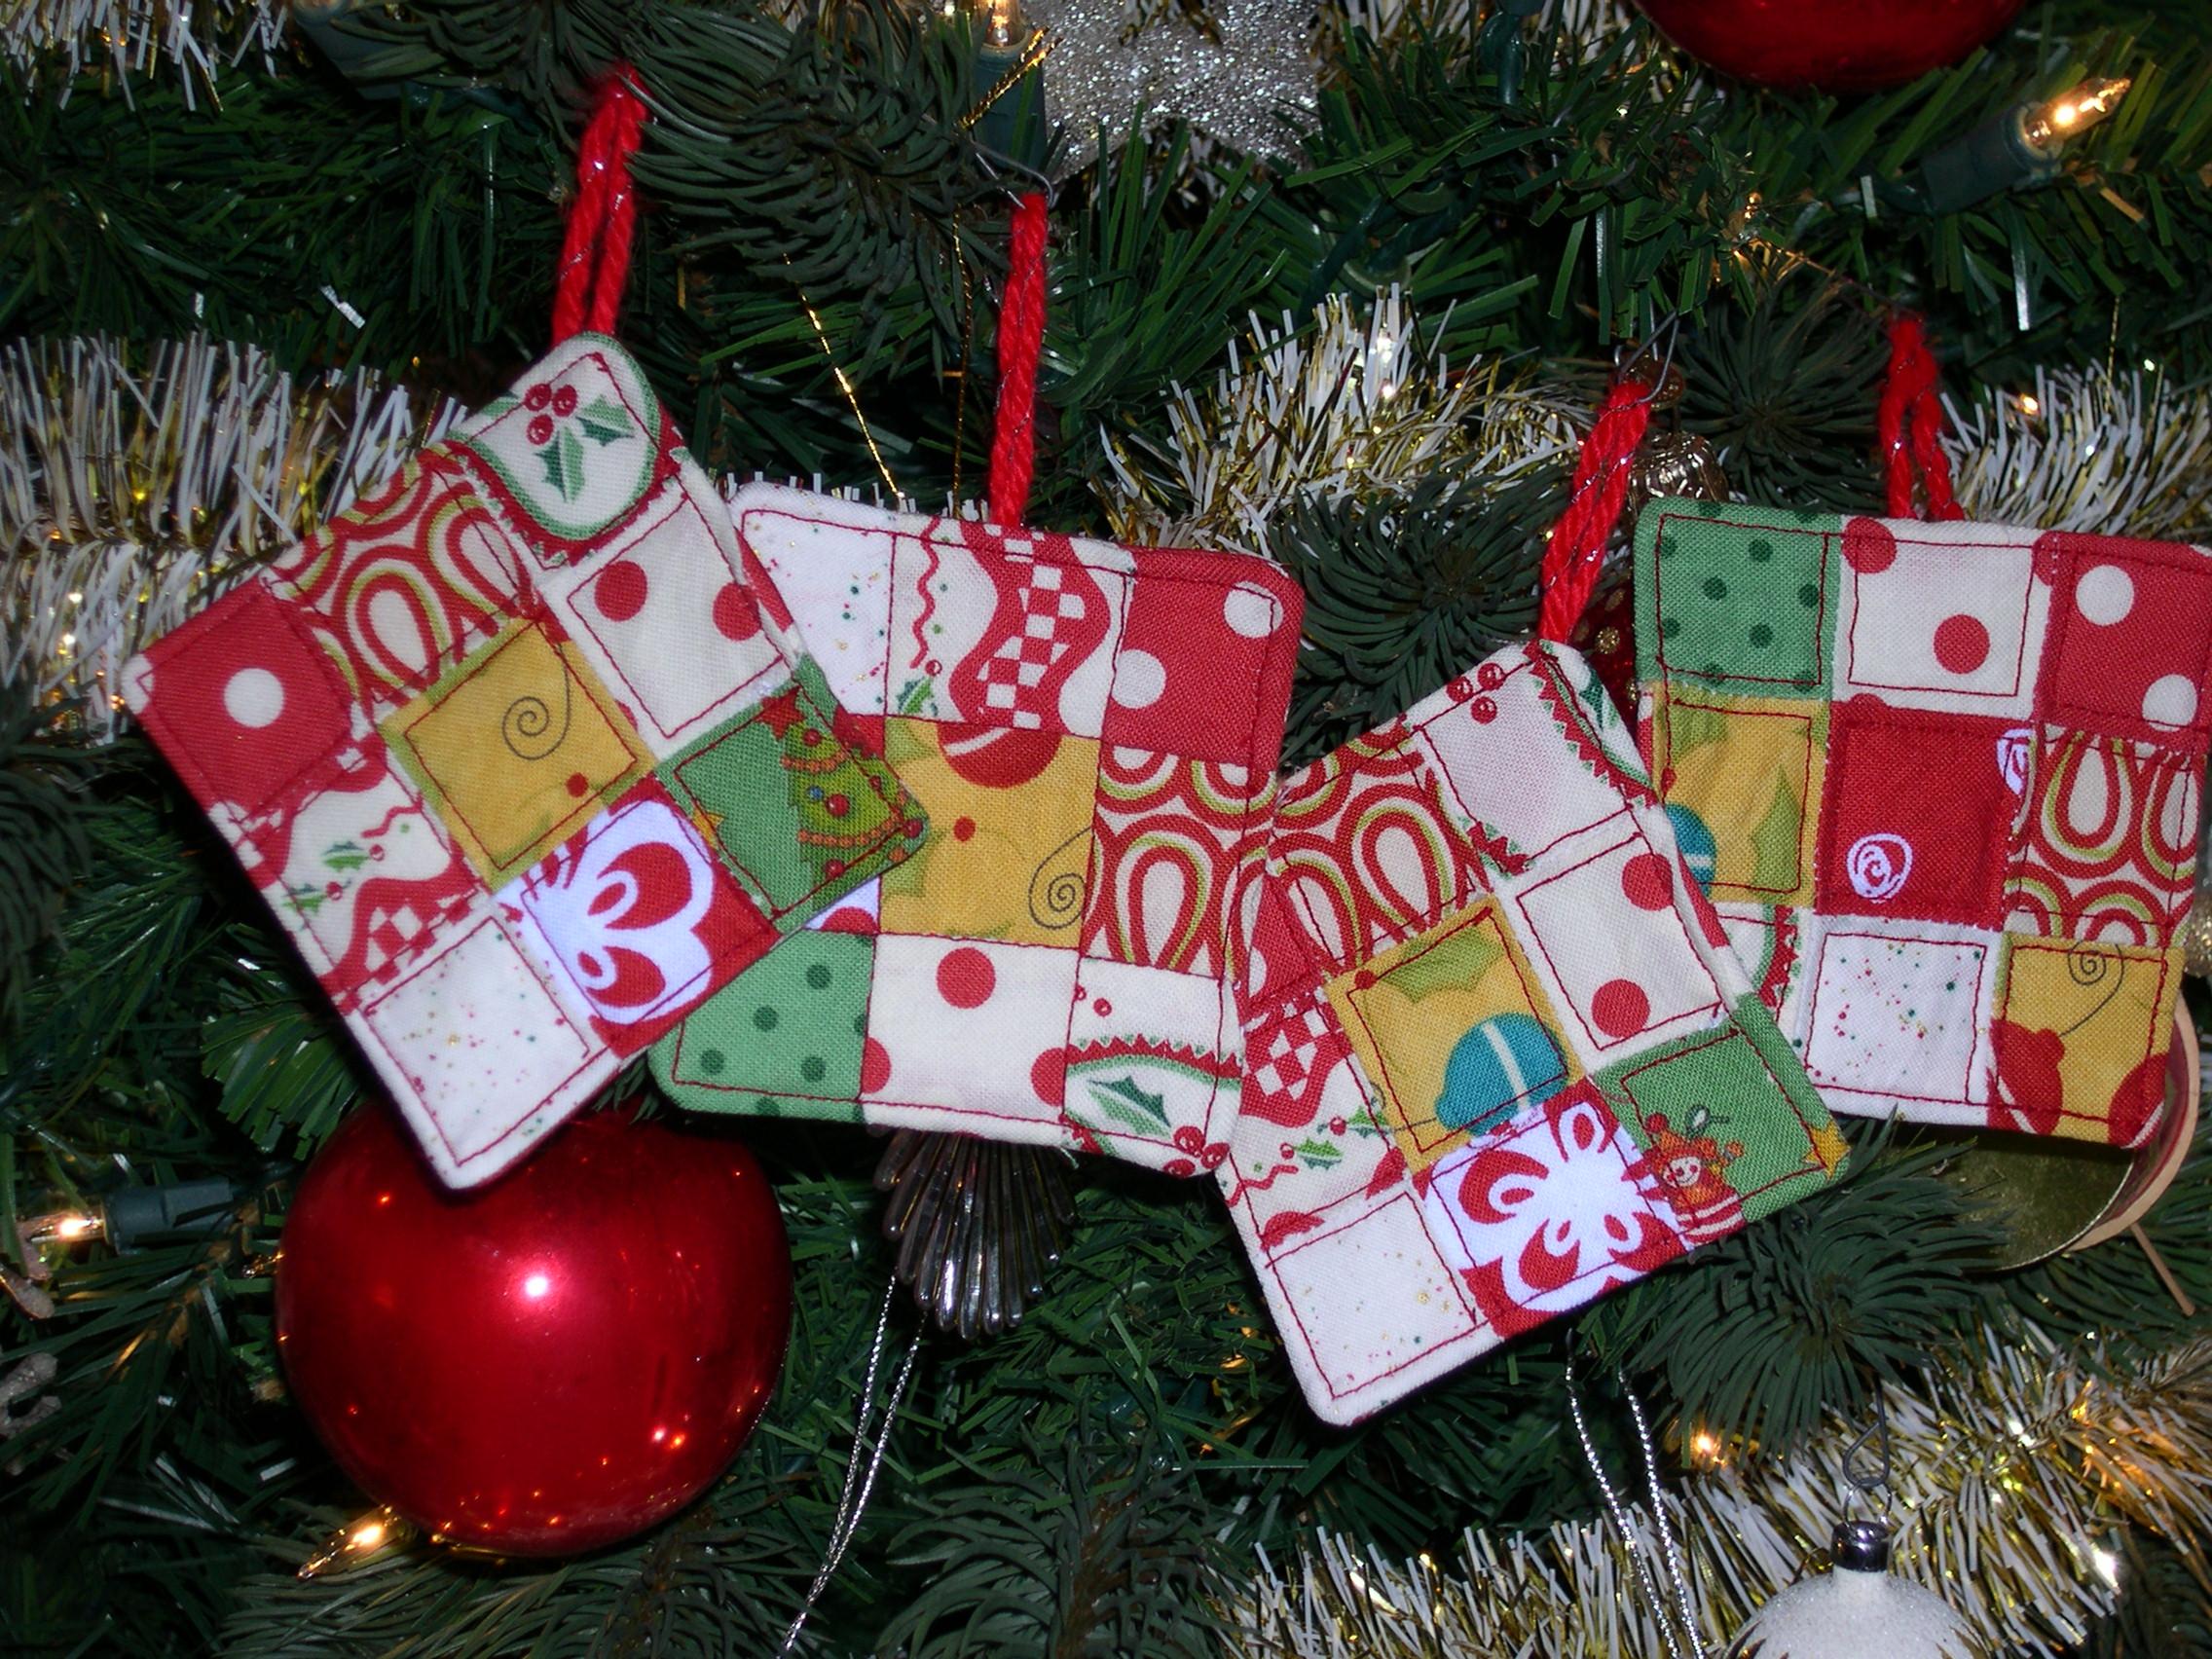 Miniature 9-patch ornaments